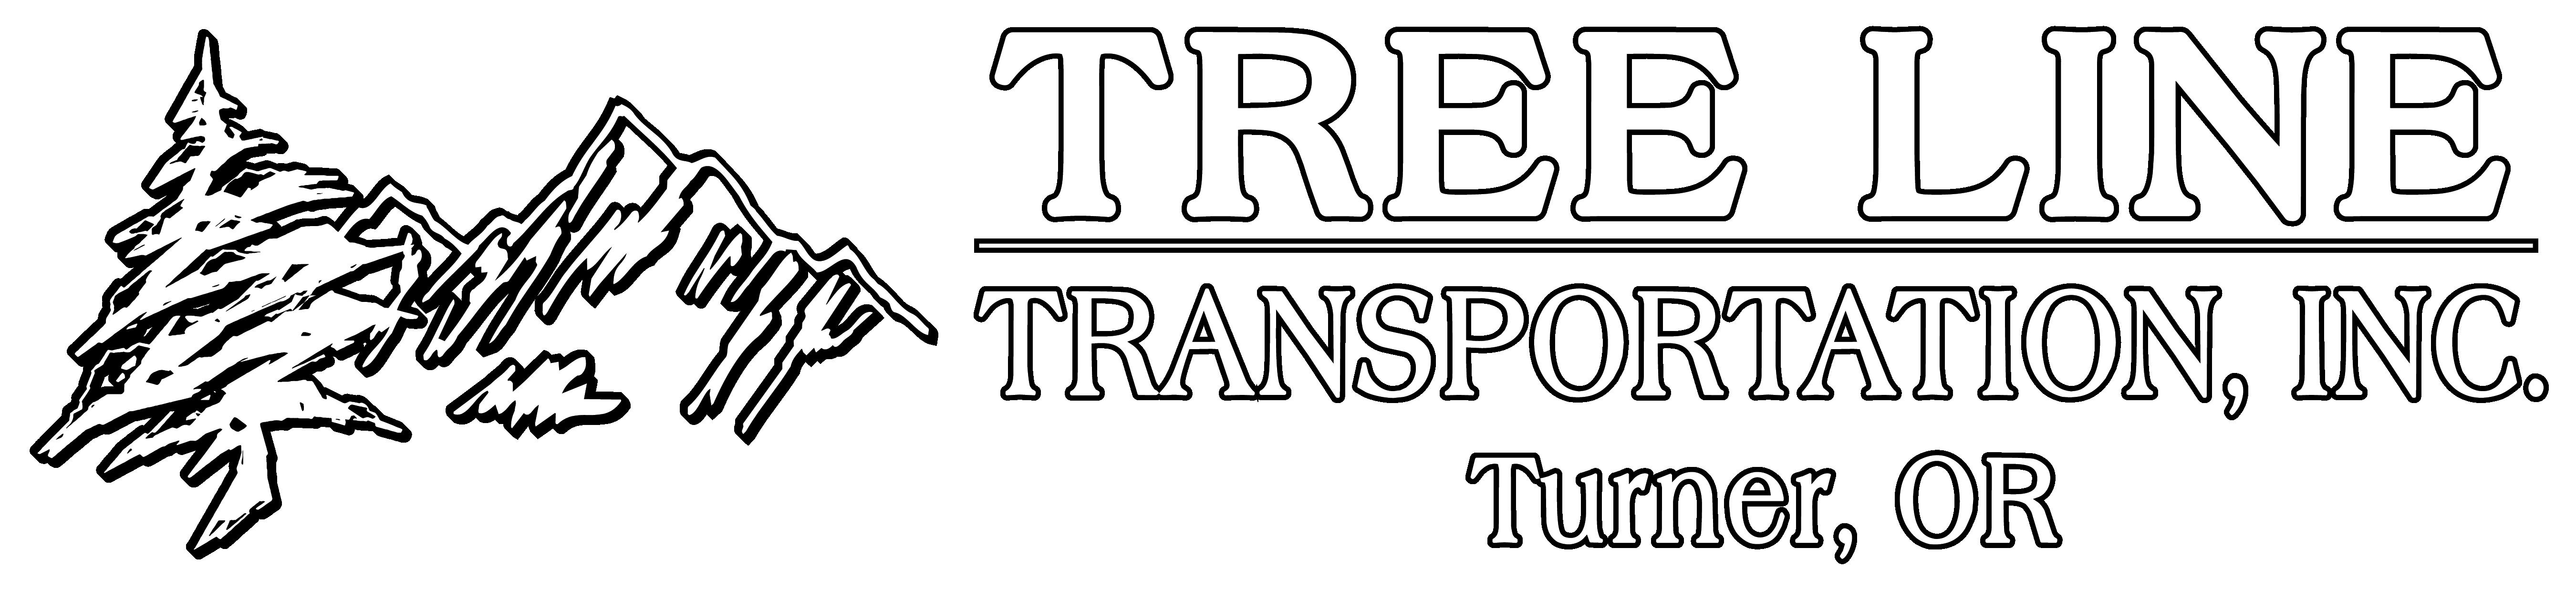 Tree Line Transportation Inc.